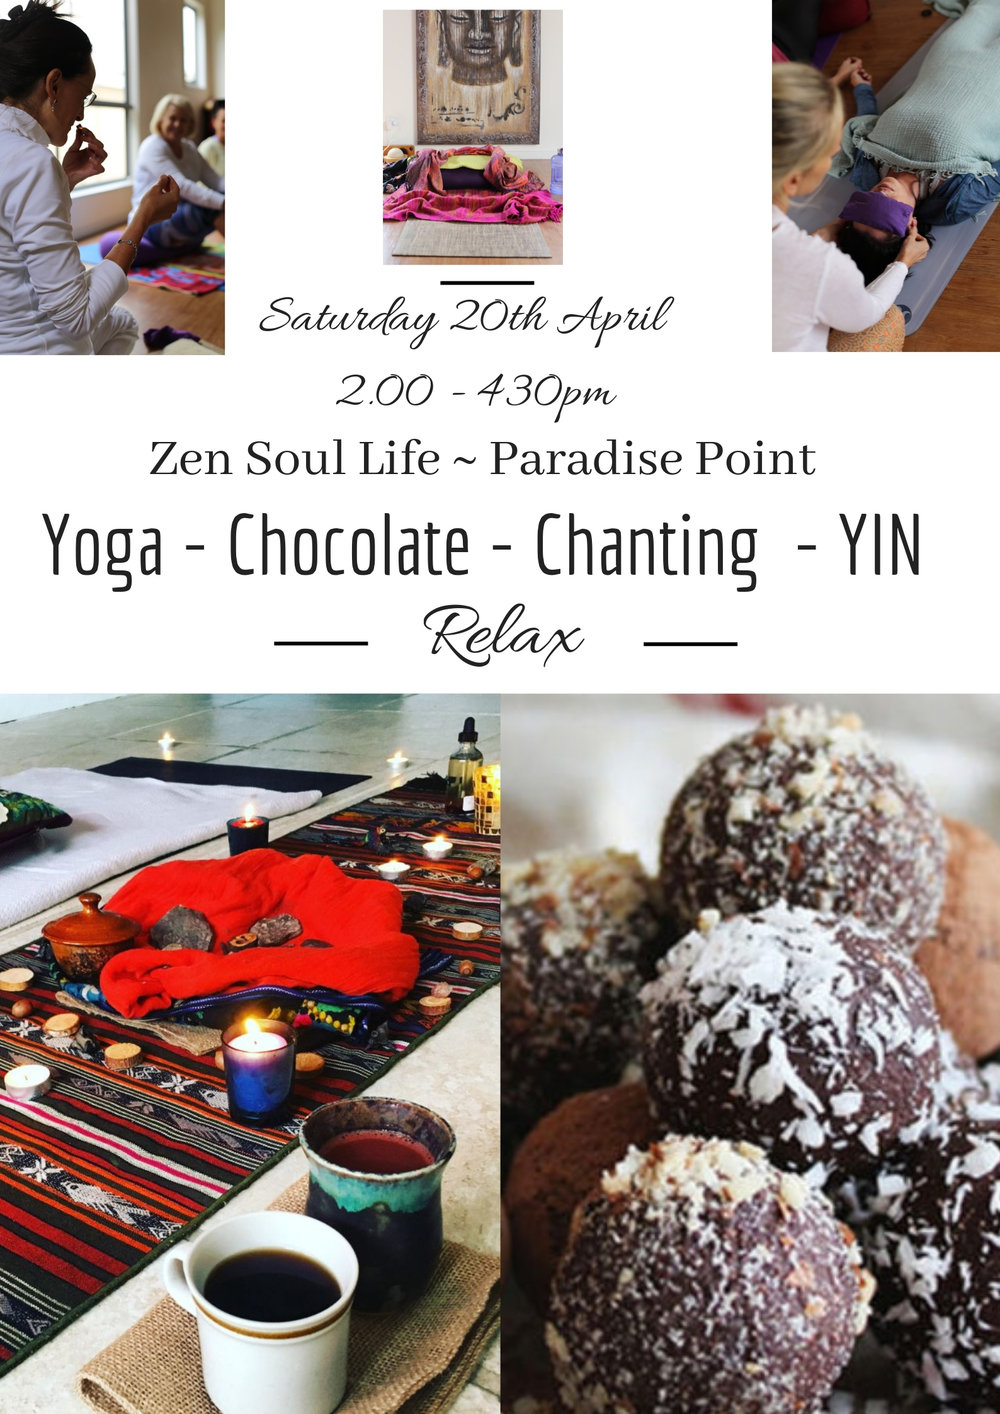 Yoga Chocolate Chanting YIN - Mini Retreat